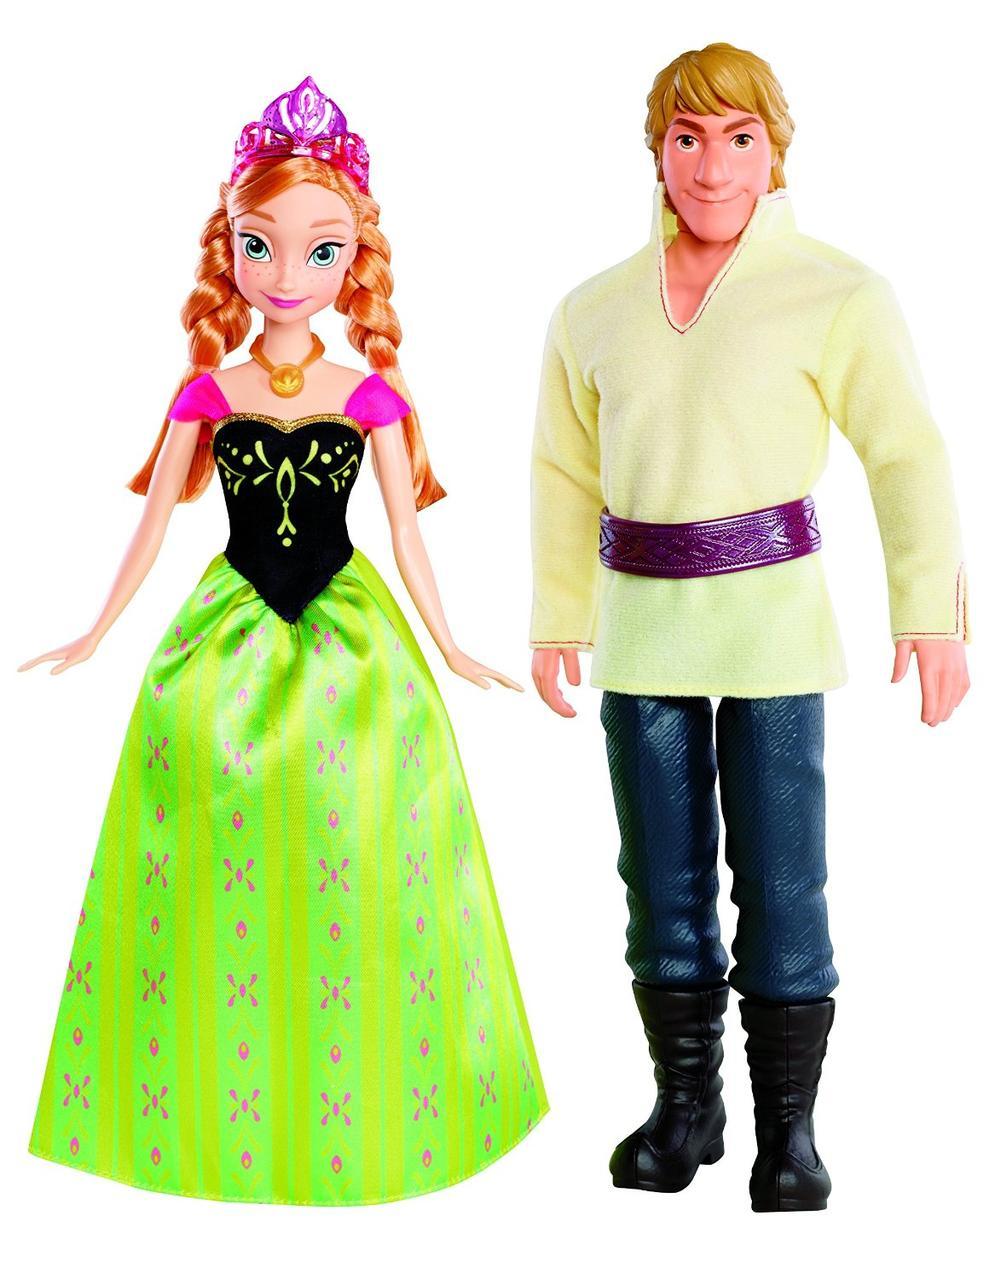 Disney Frozen Анна и Кристофф Замороженные  Anna and Kristoff Doll, 2-Pack